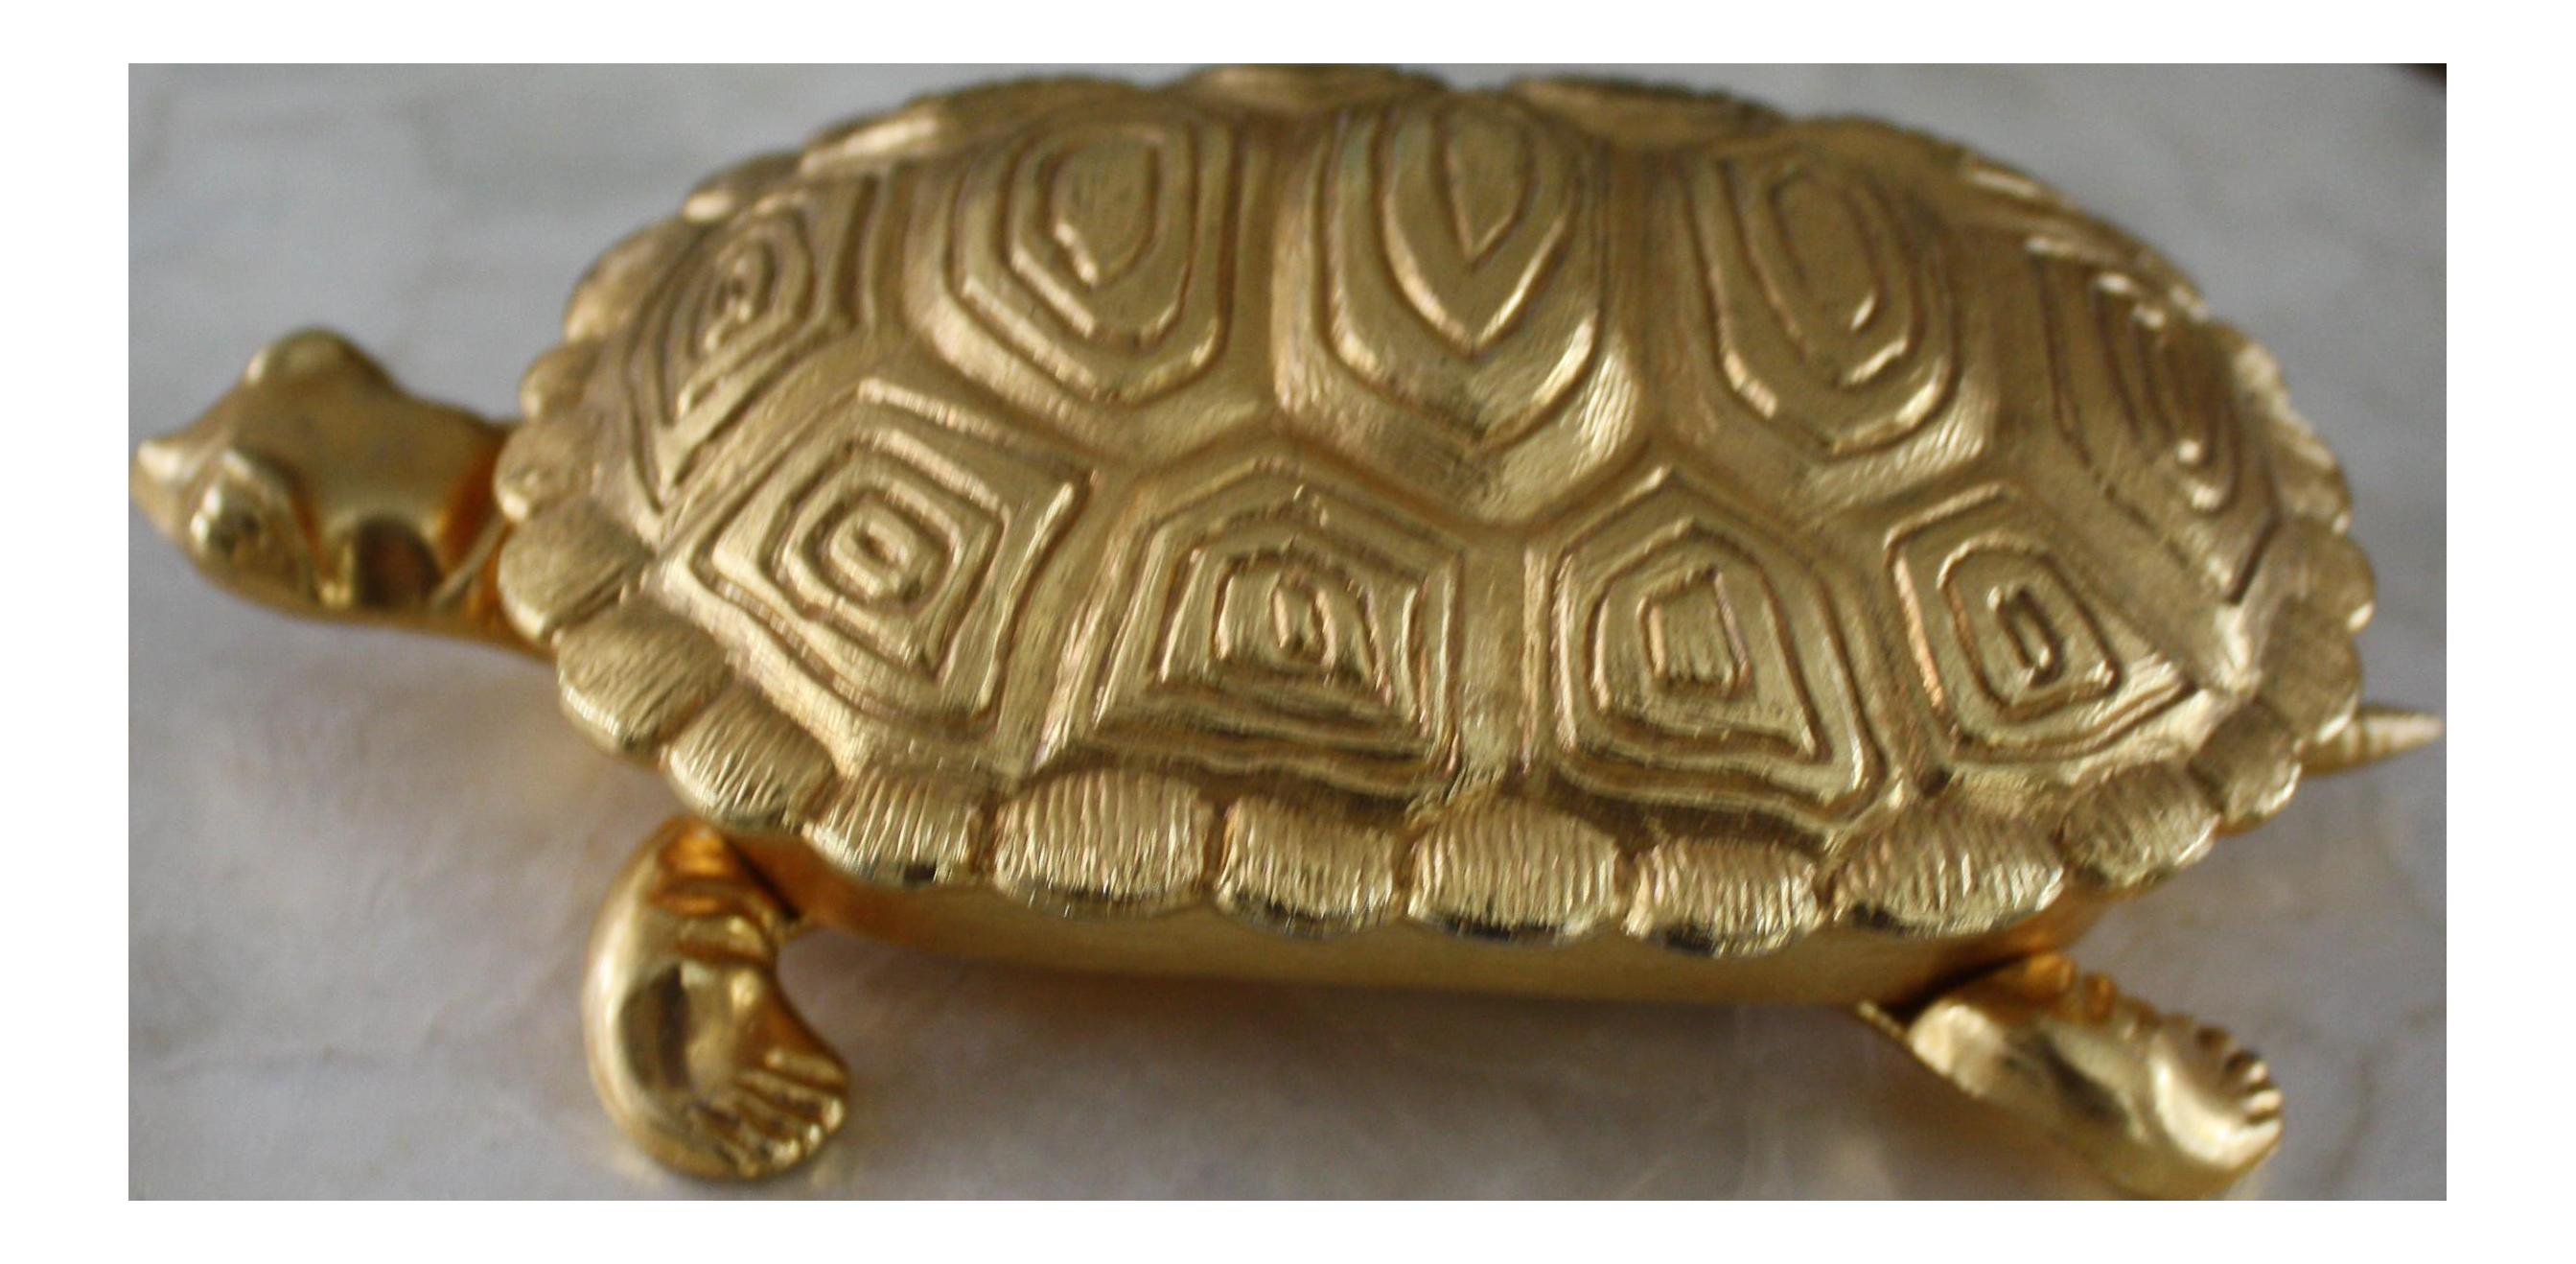 Vintage Gold Metal Turtle Crumber / Table Butler / Crumb Sweeper / Crumb  Brush / Silent Butler